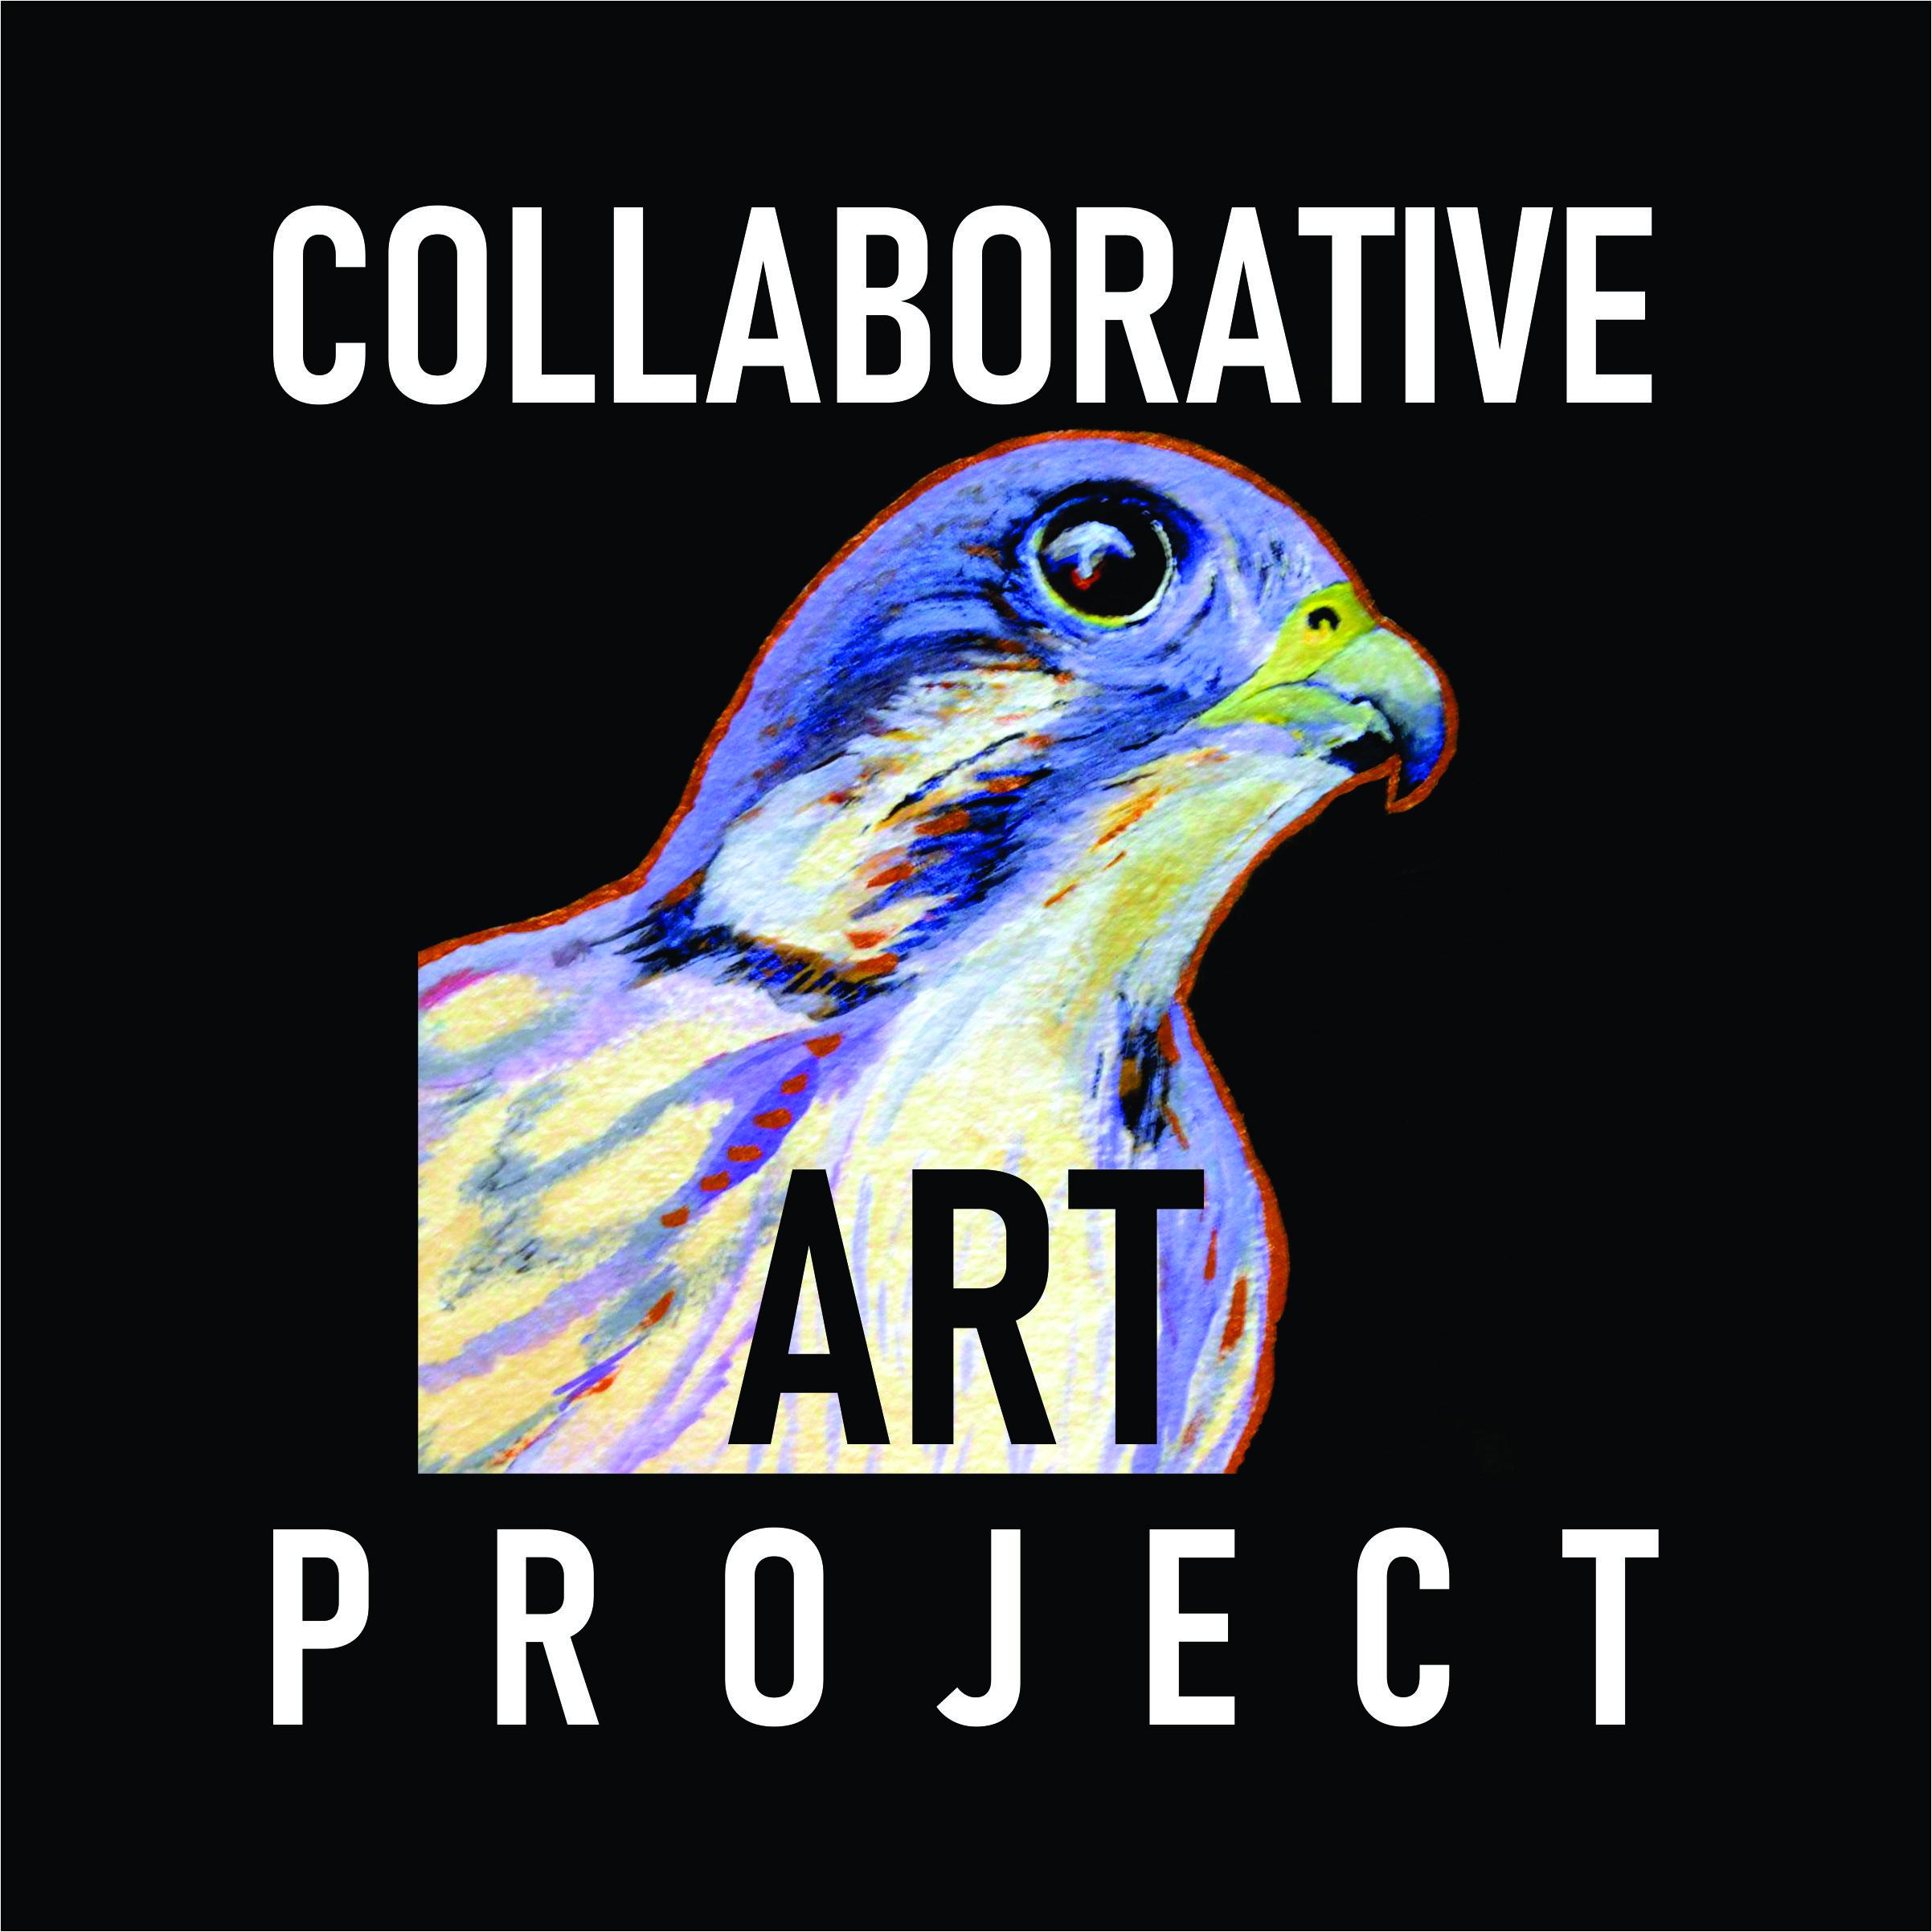 Collaborative art project logo.jpg